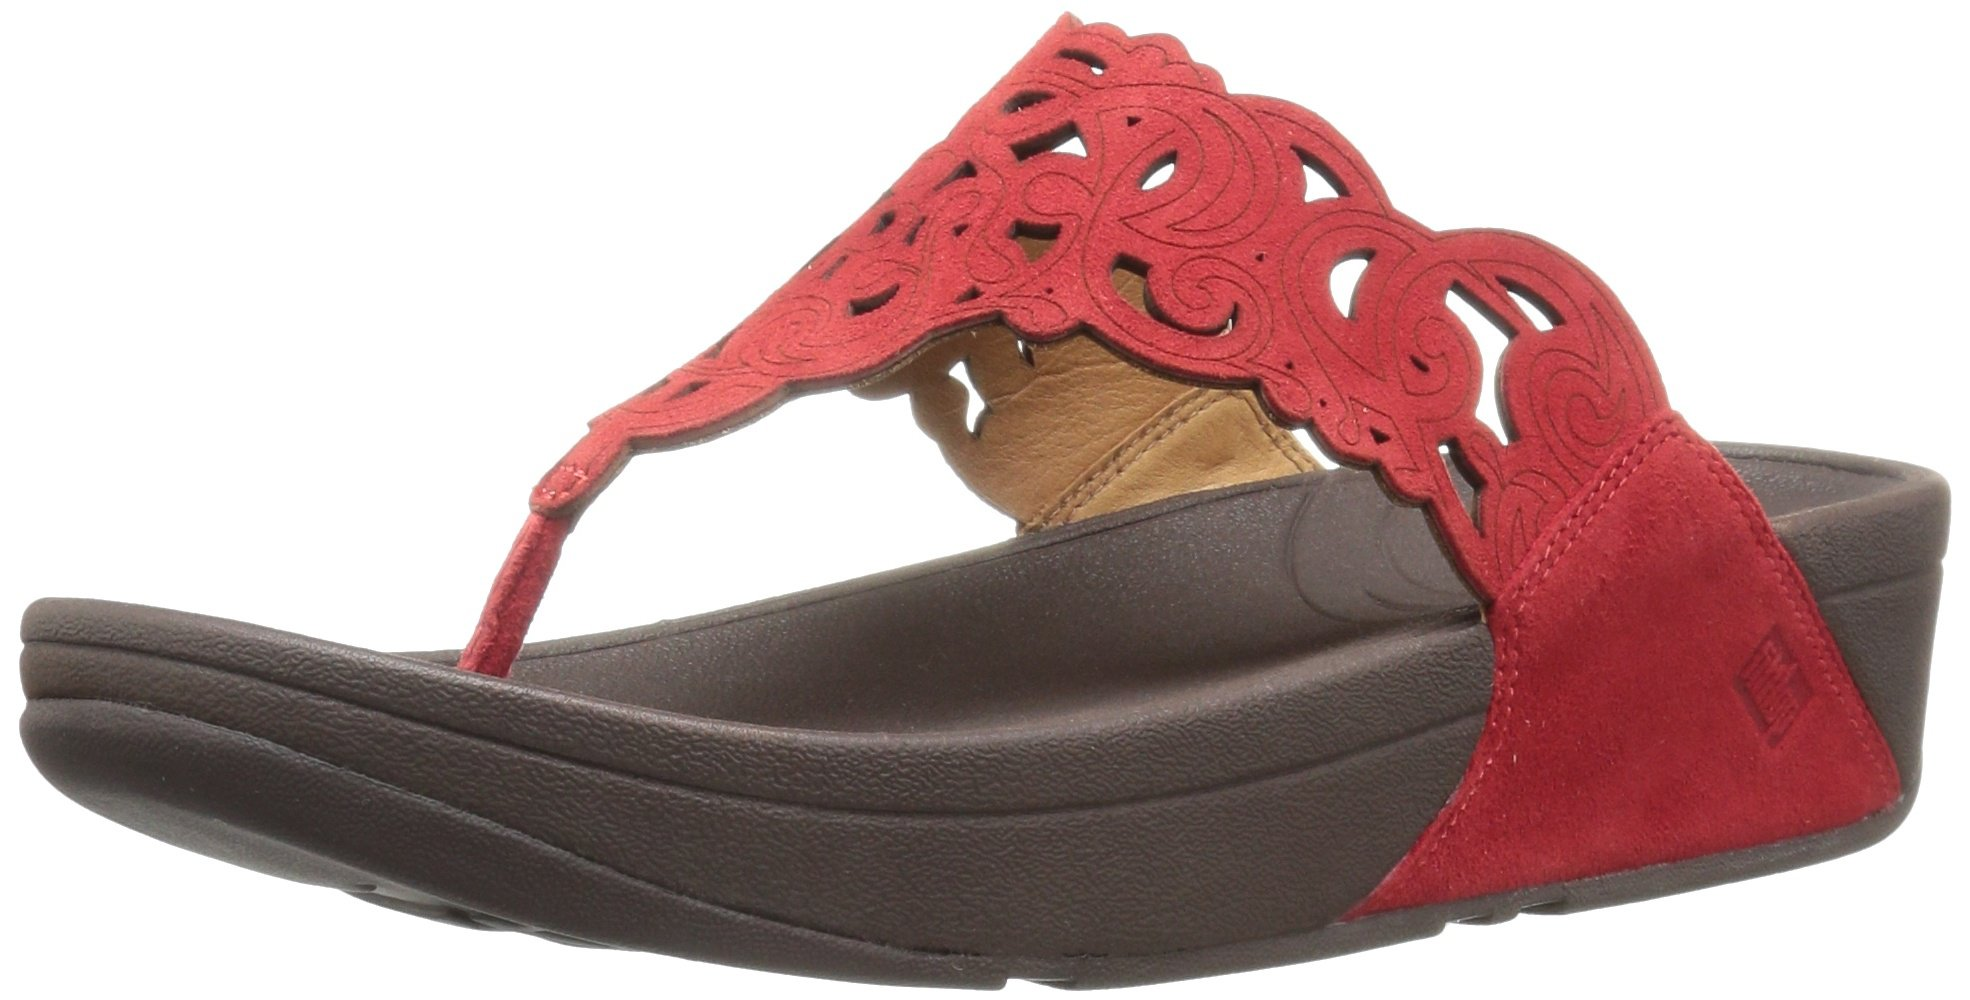 FitFlop Women's Flora Flip Flop, Red, 8.5 M US